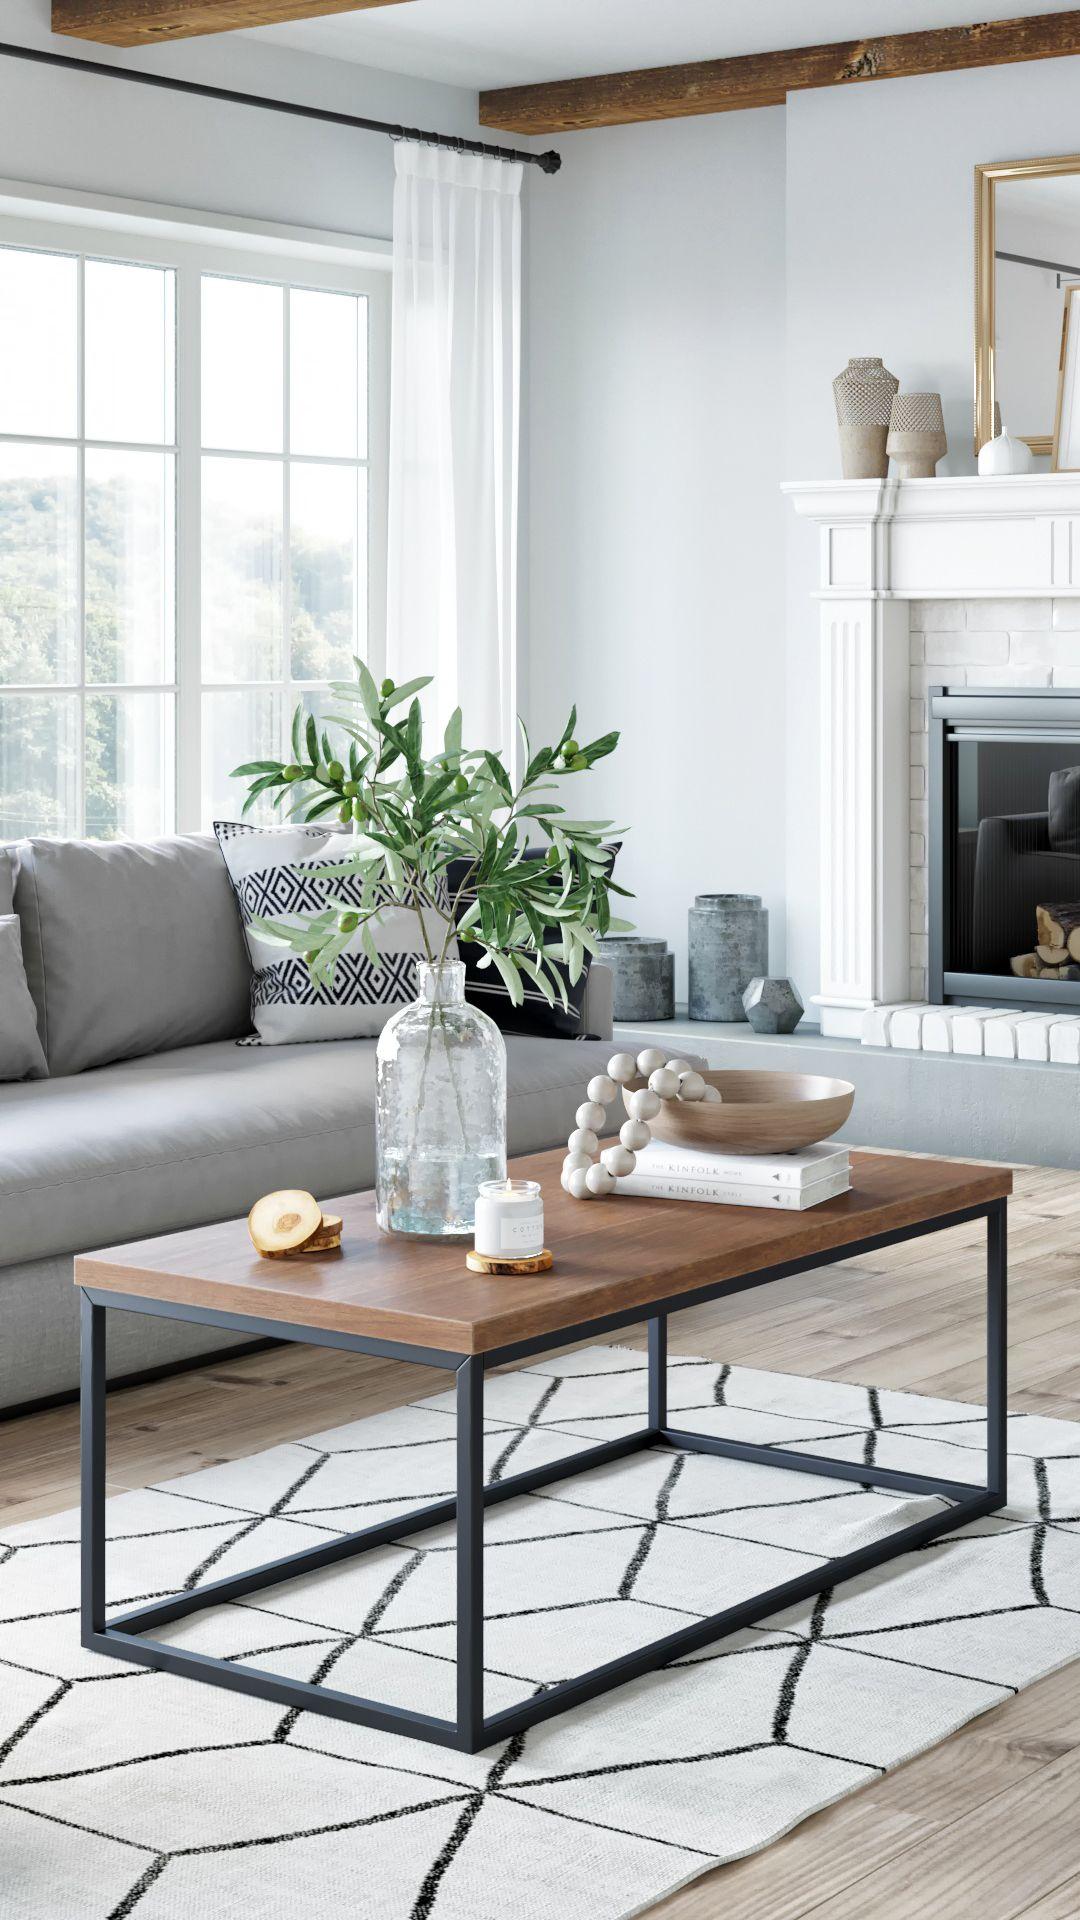 Doxa Modern Industrial Wood Coffee Table With Black Metal Box